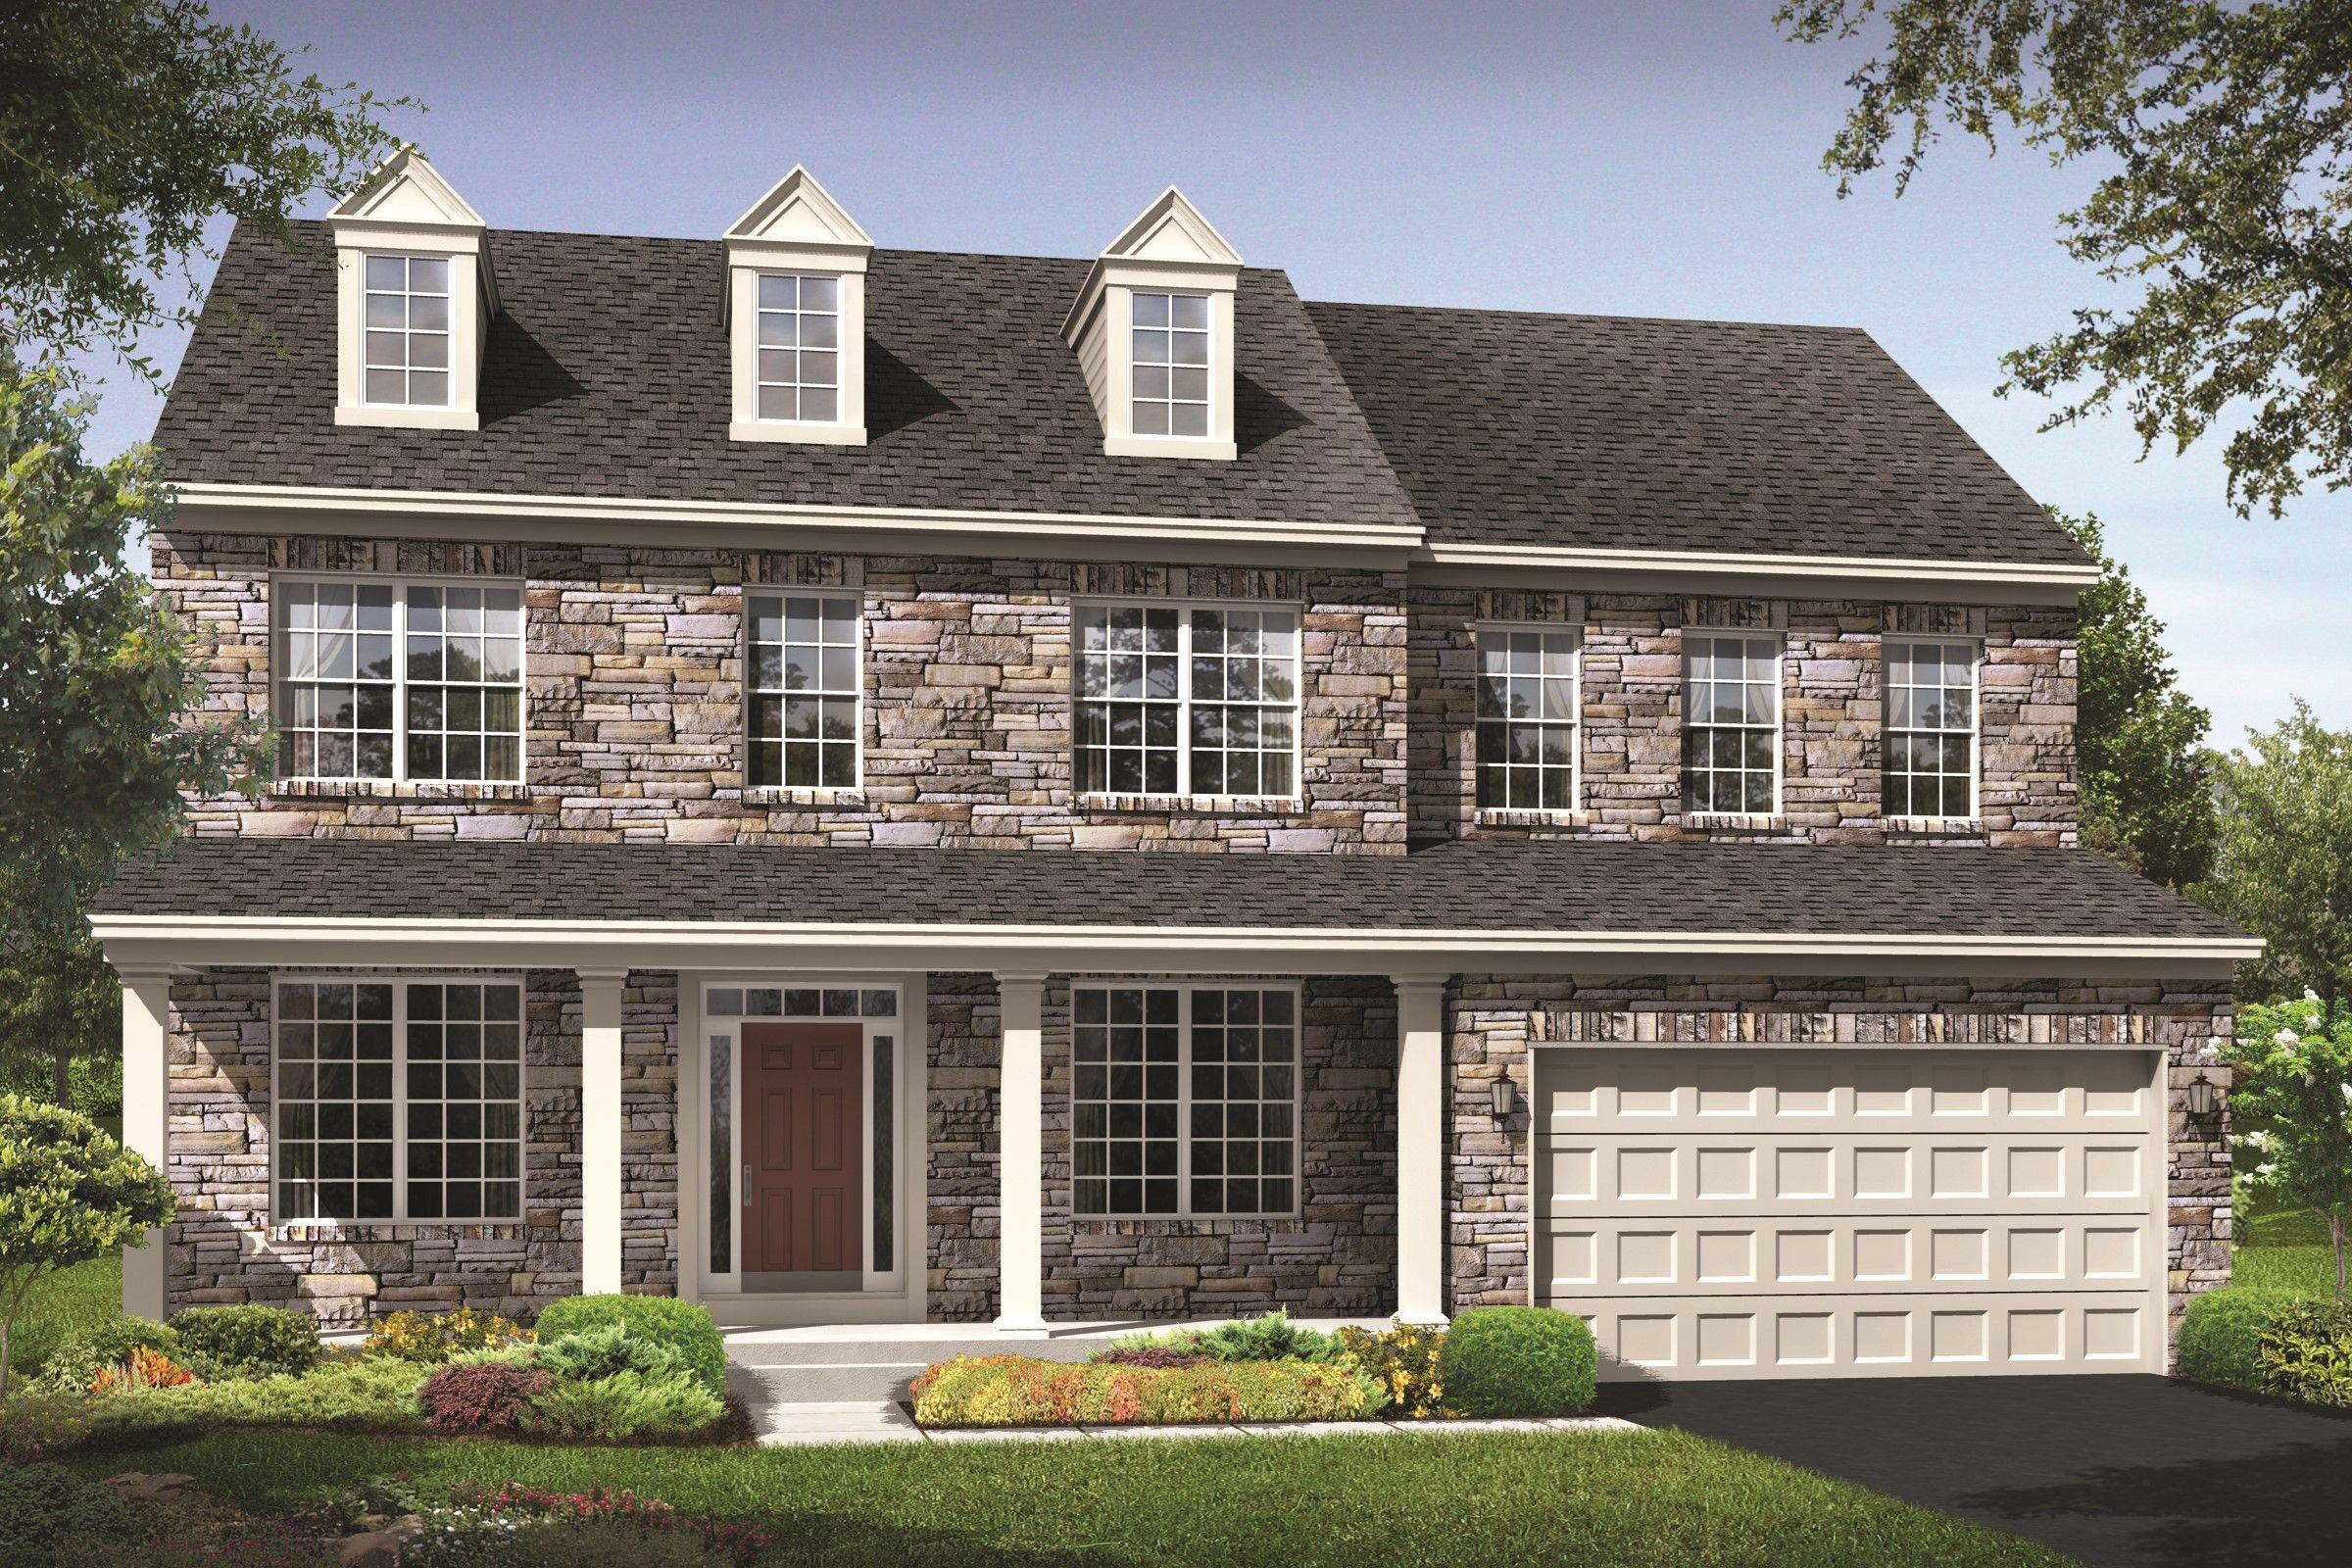 5579 James Young Way, Homesite 10, Fairfax, VA Homes & Land - Real Estate